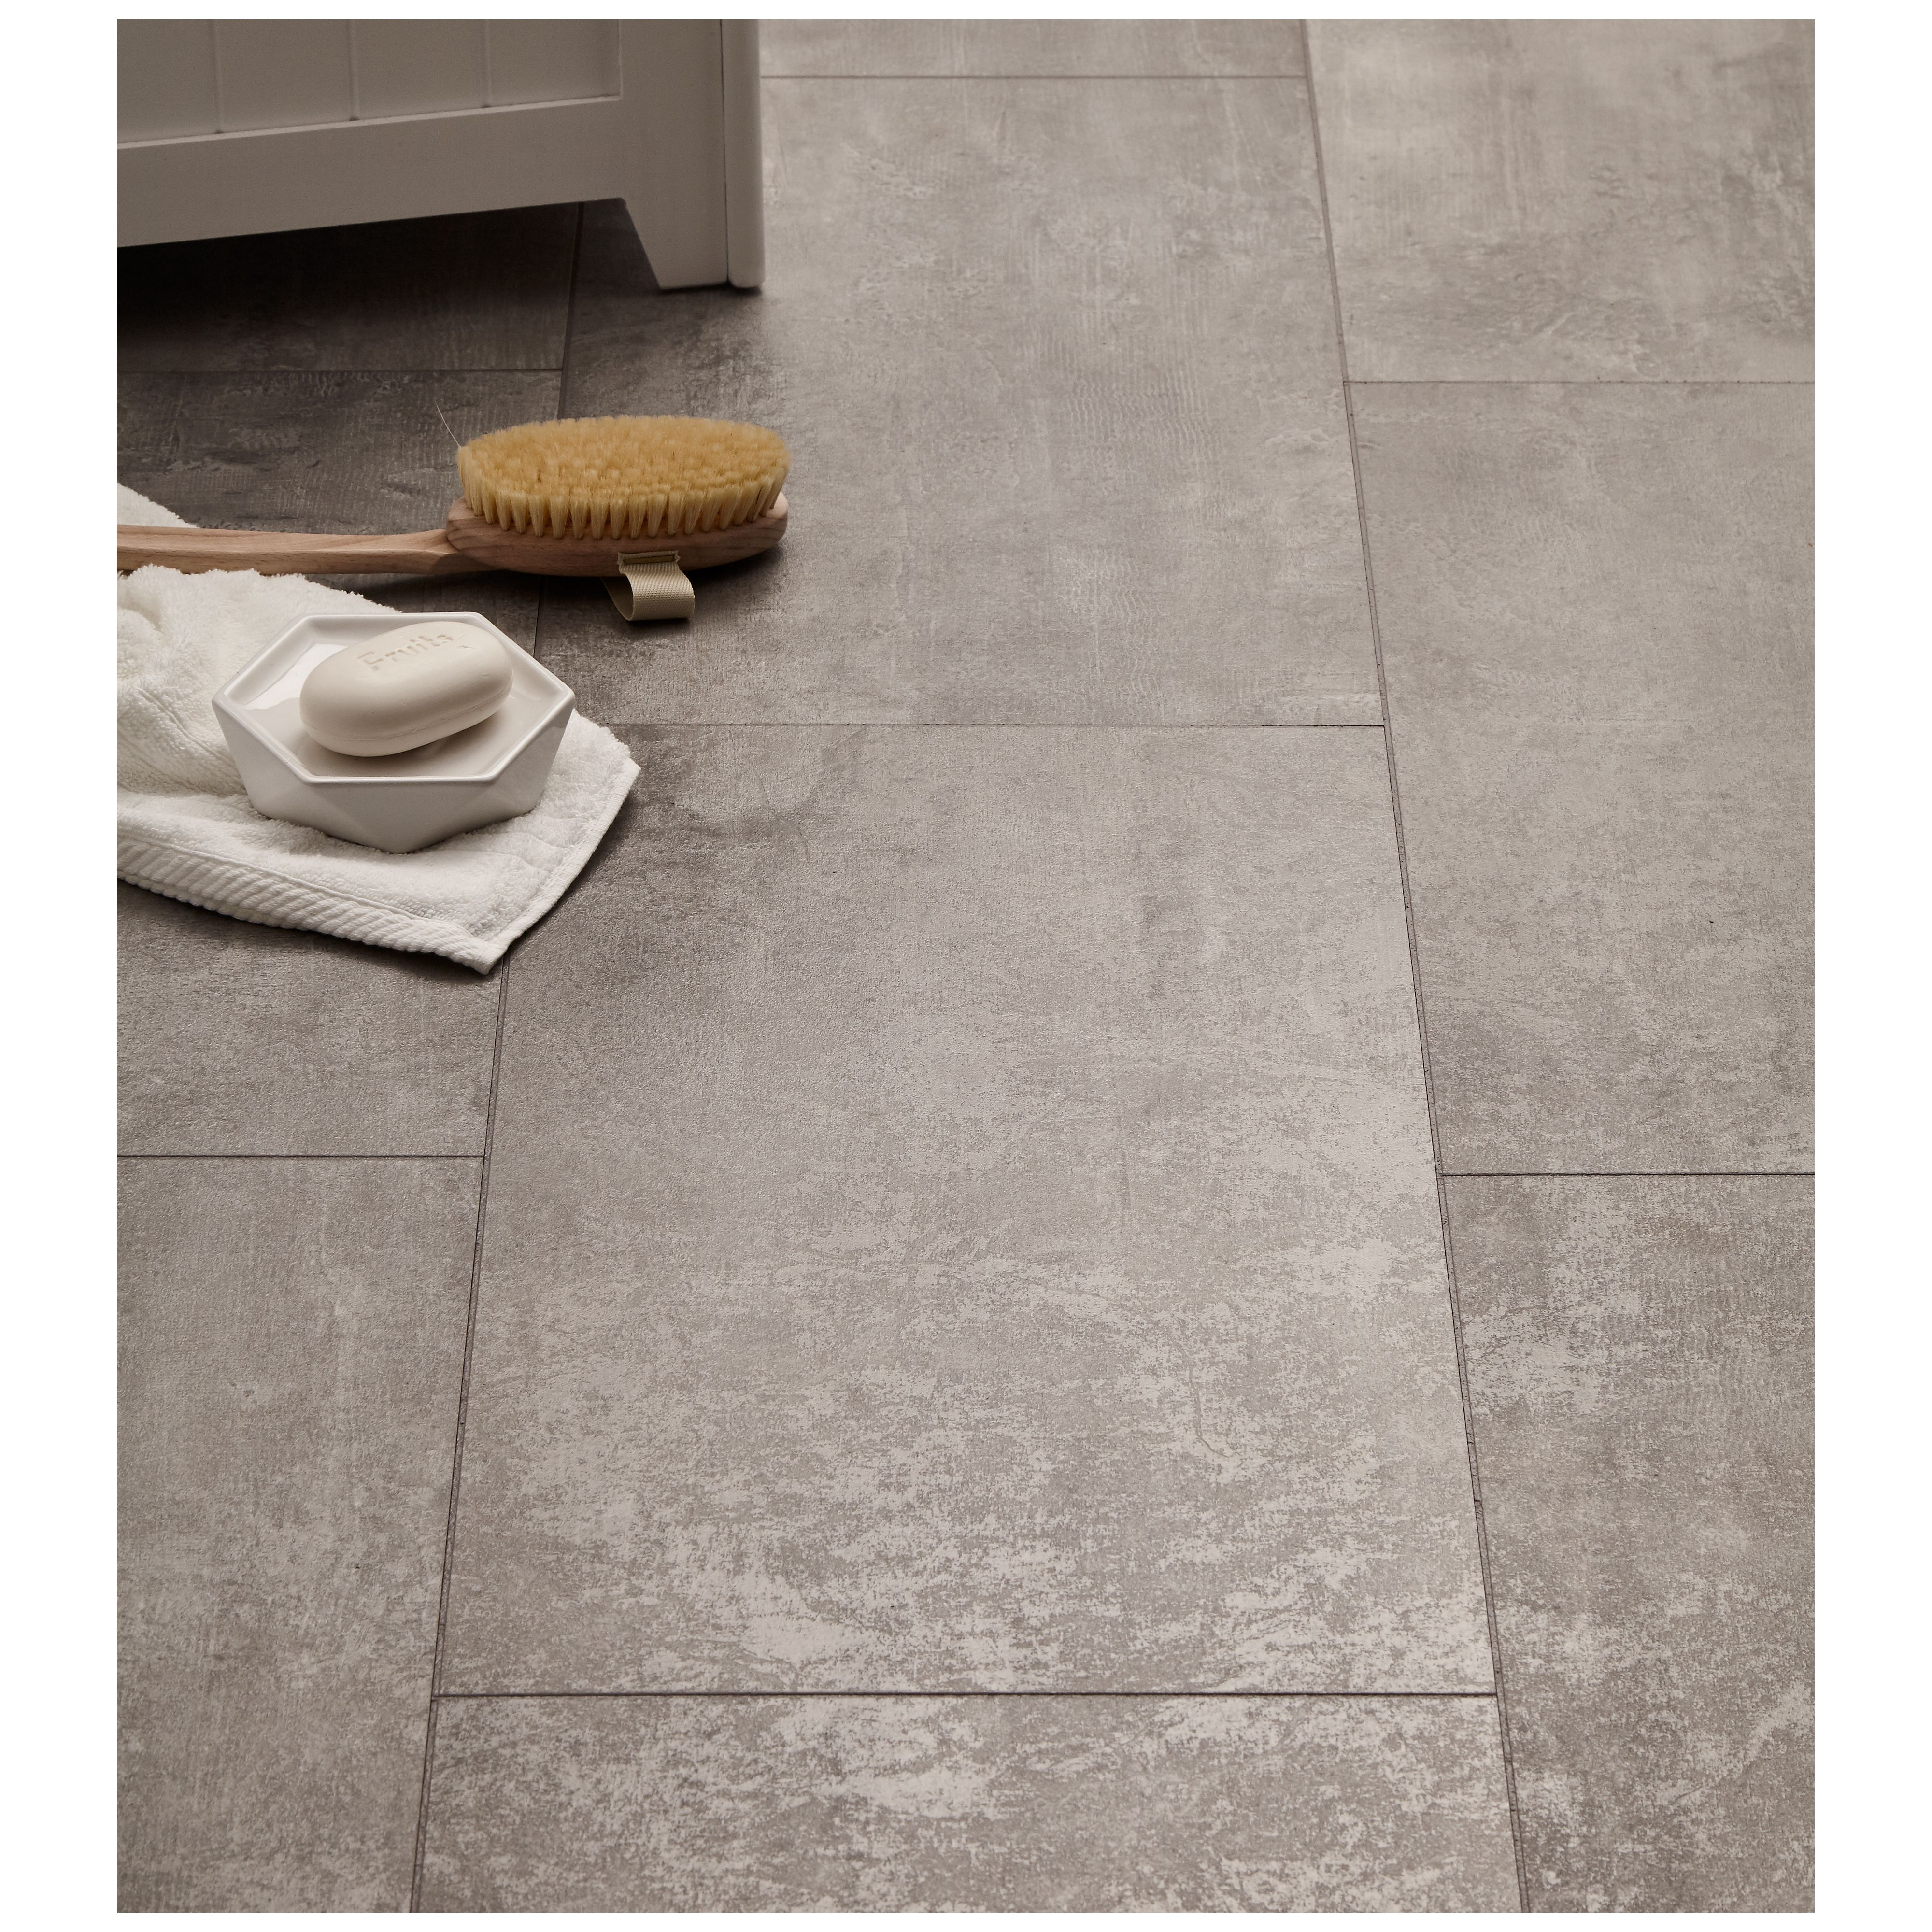 Laminae Concrete Tile Effect Laminate, Cement Effect Laminate Flooring